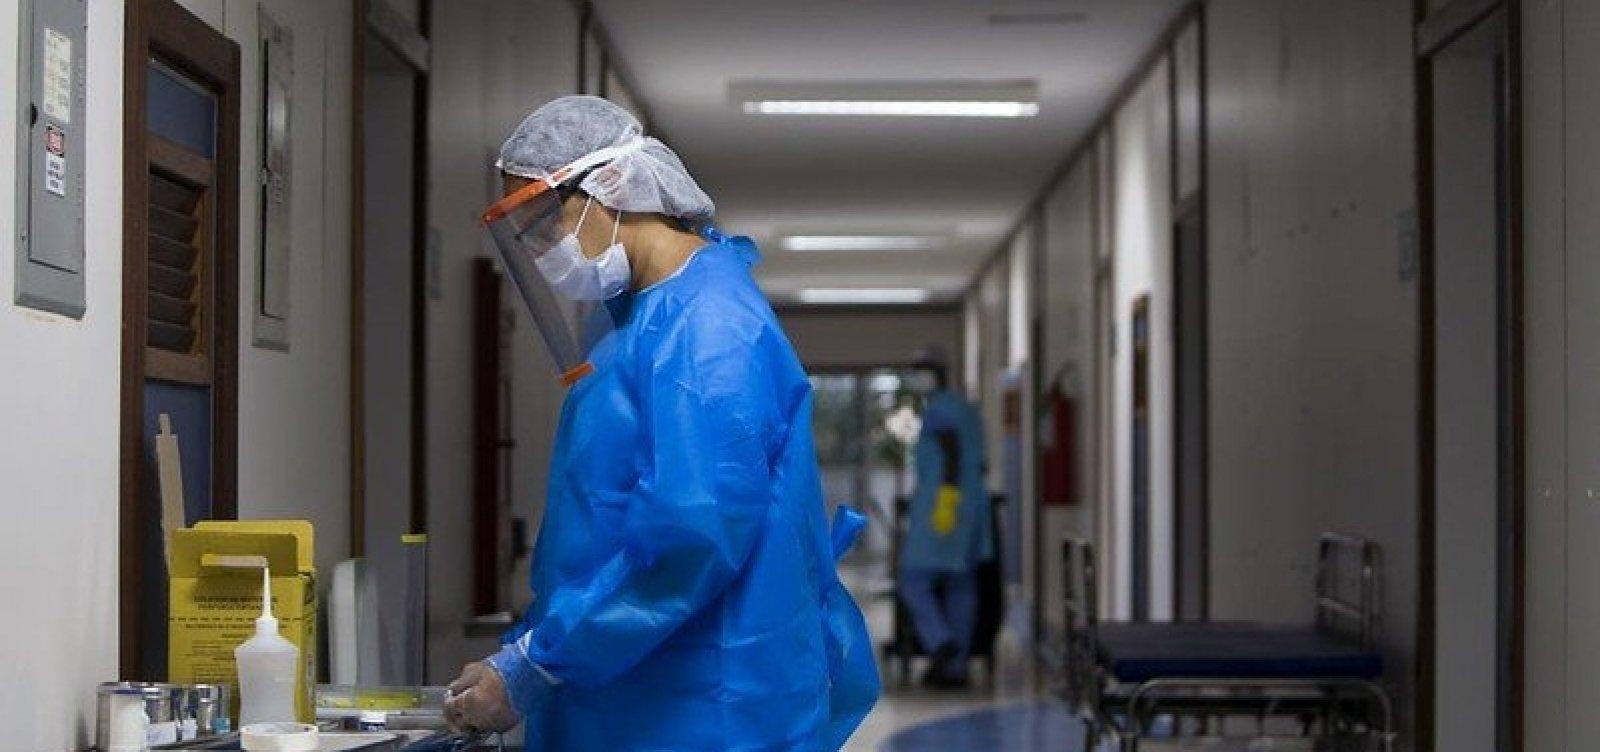 [Bahia registra 2.956 novos casos de coronavírus; total de mortes chega a 819]